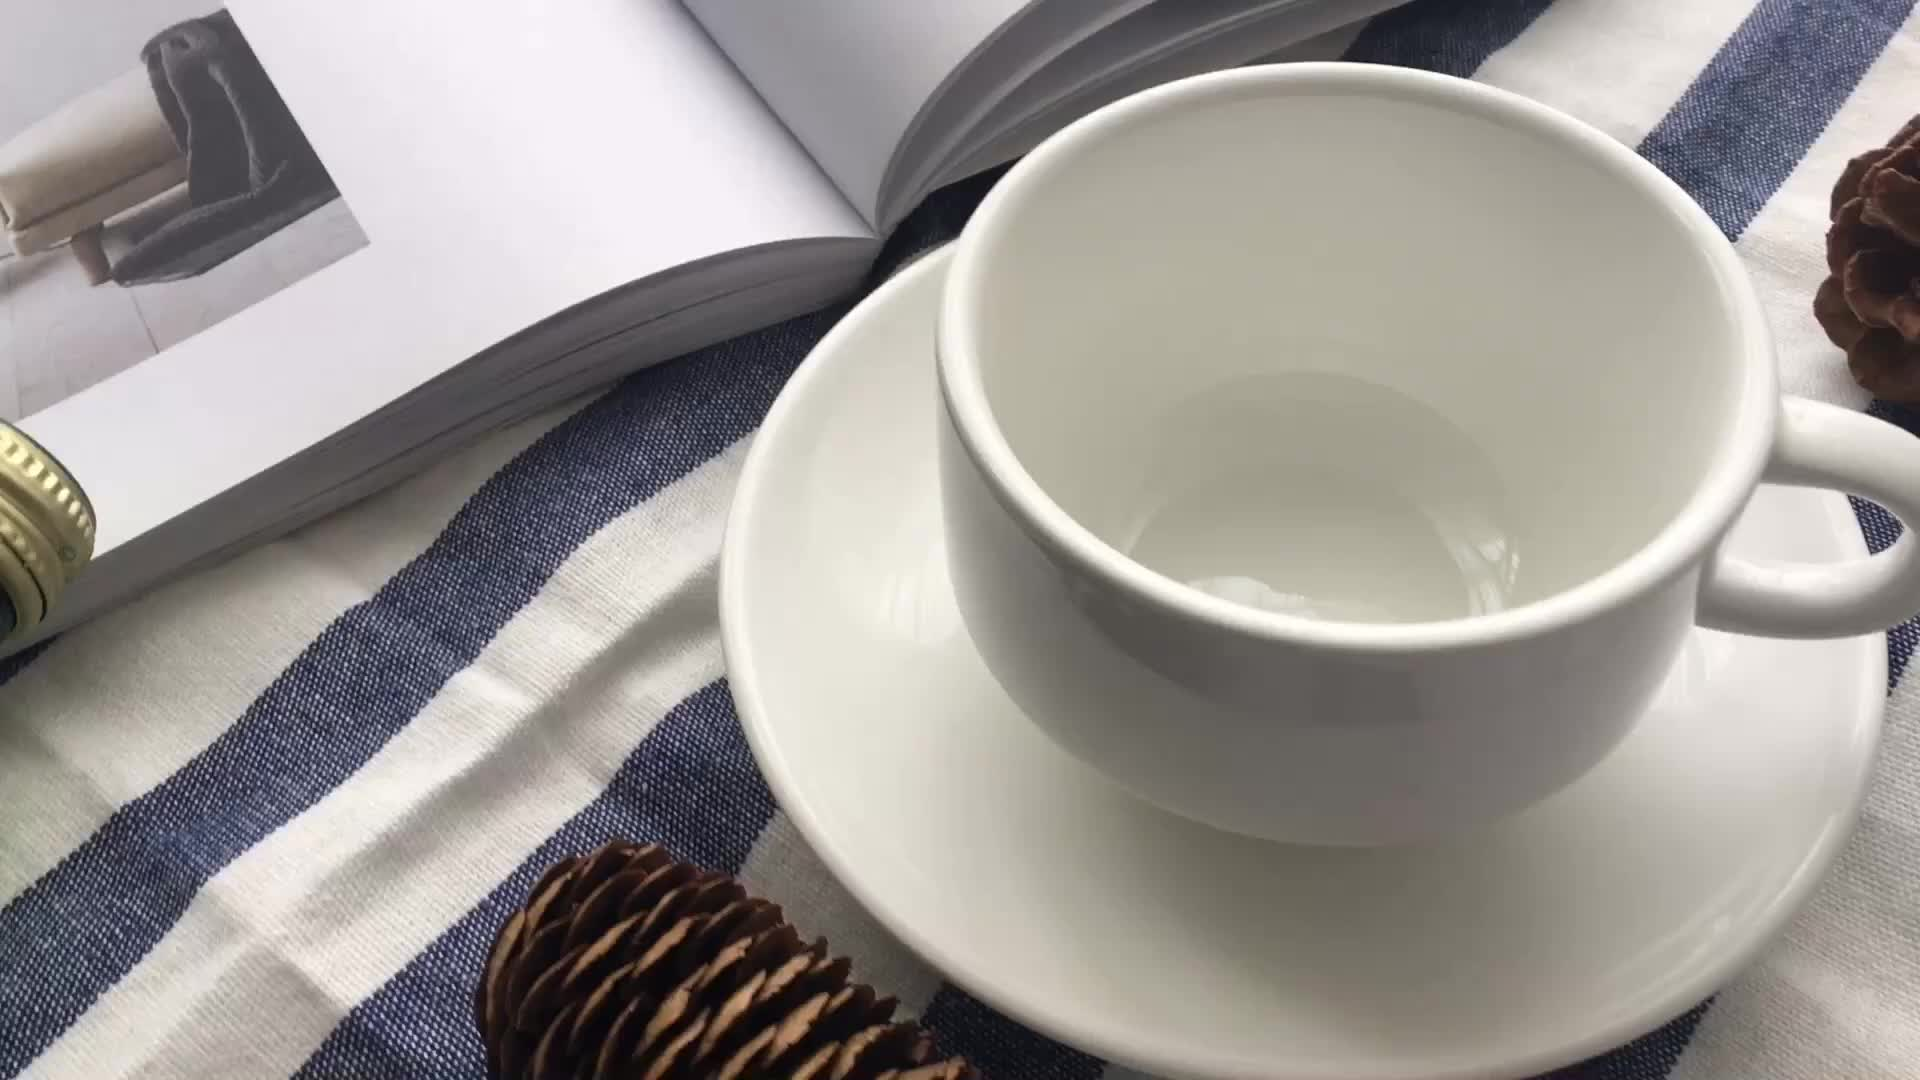 Custom Ceramic Coffee Cup Saucer